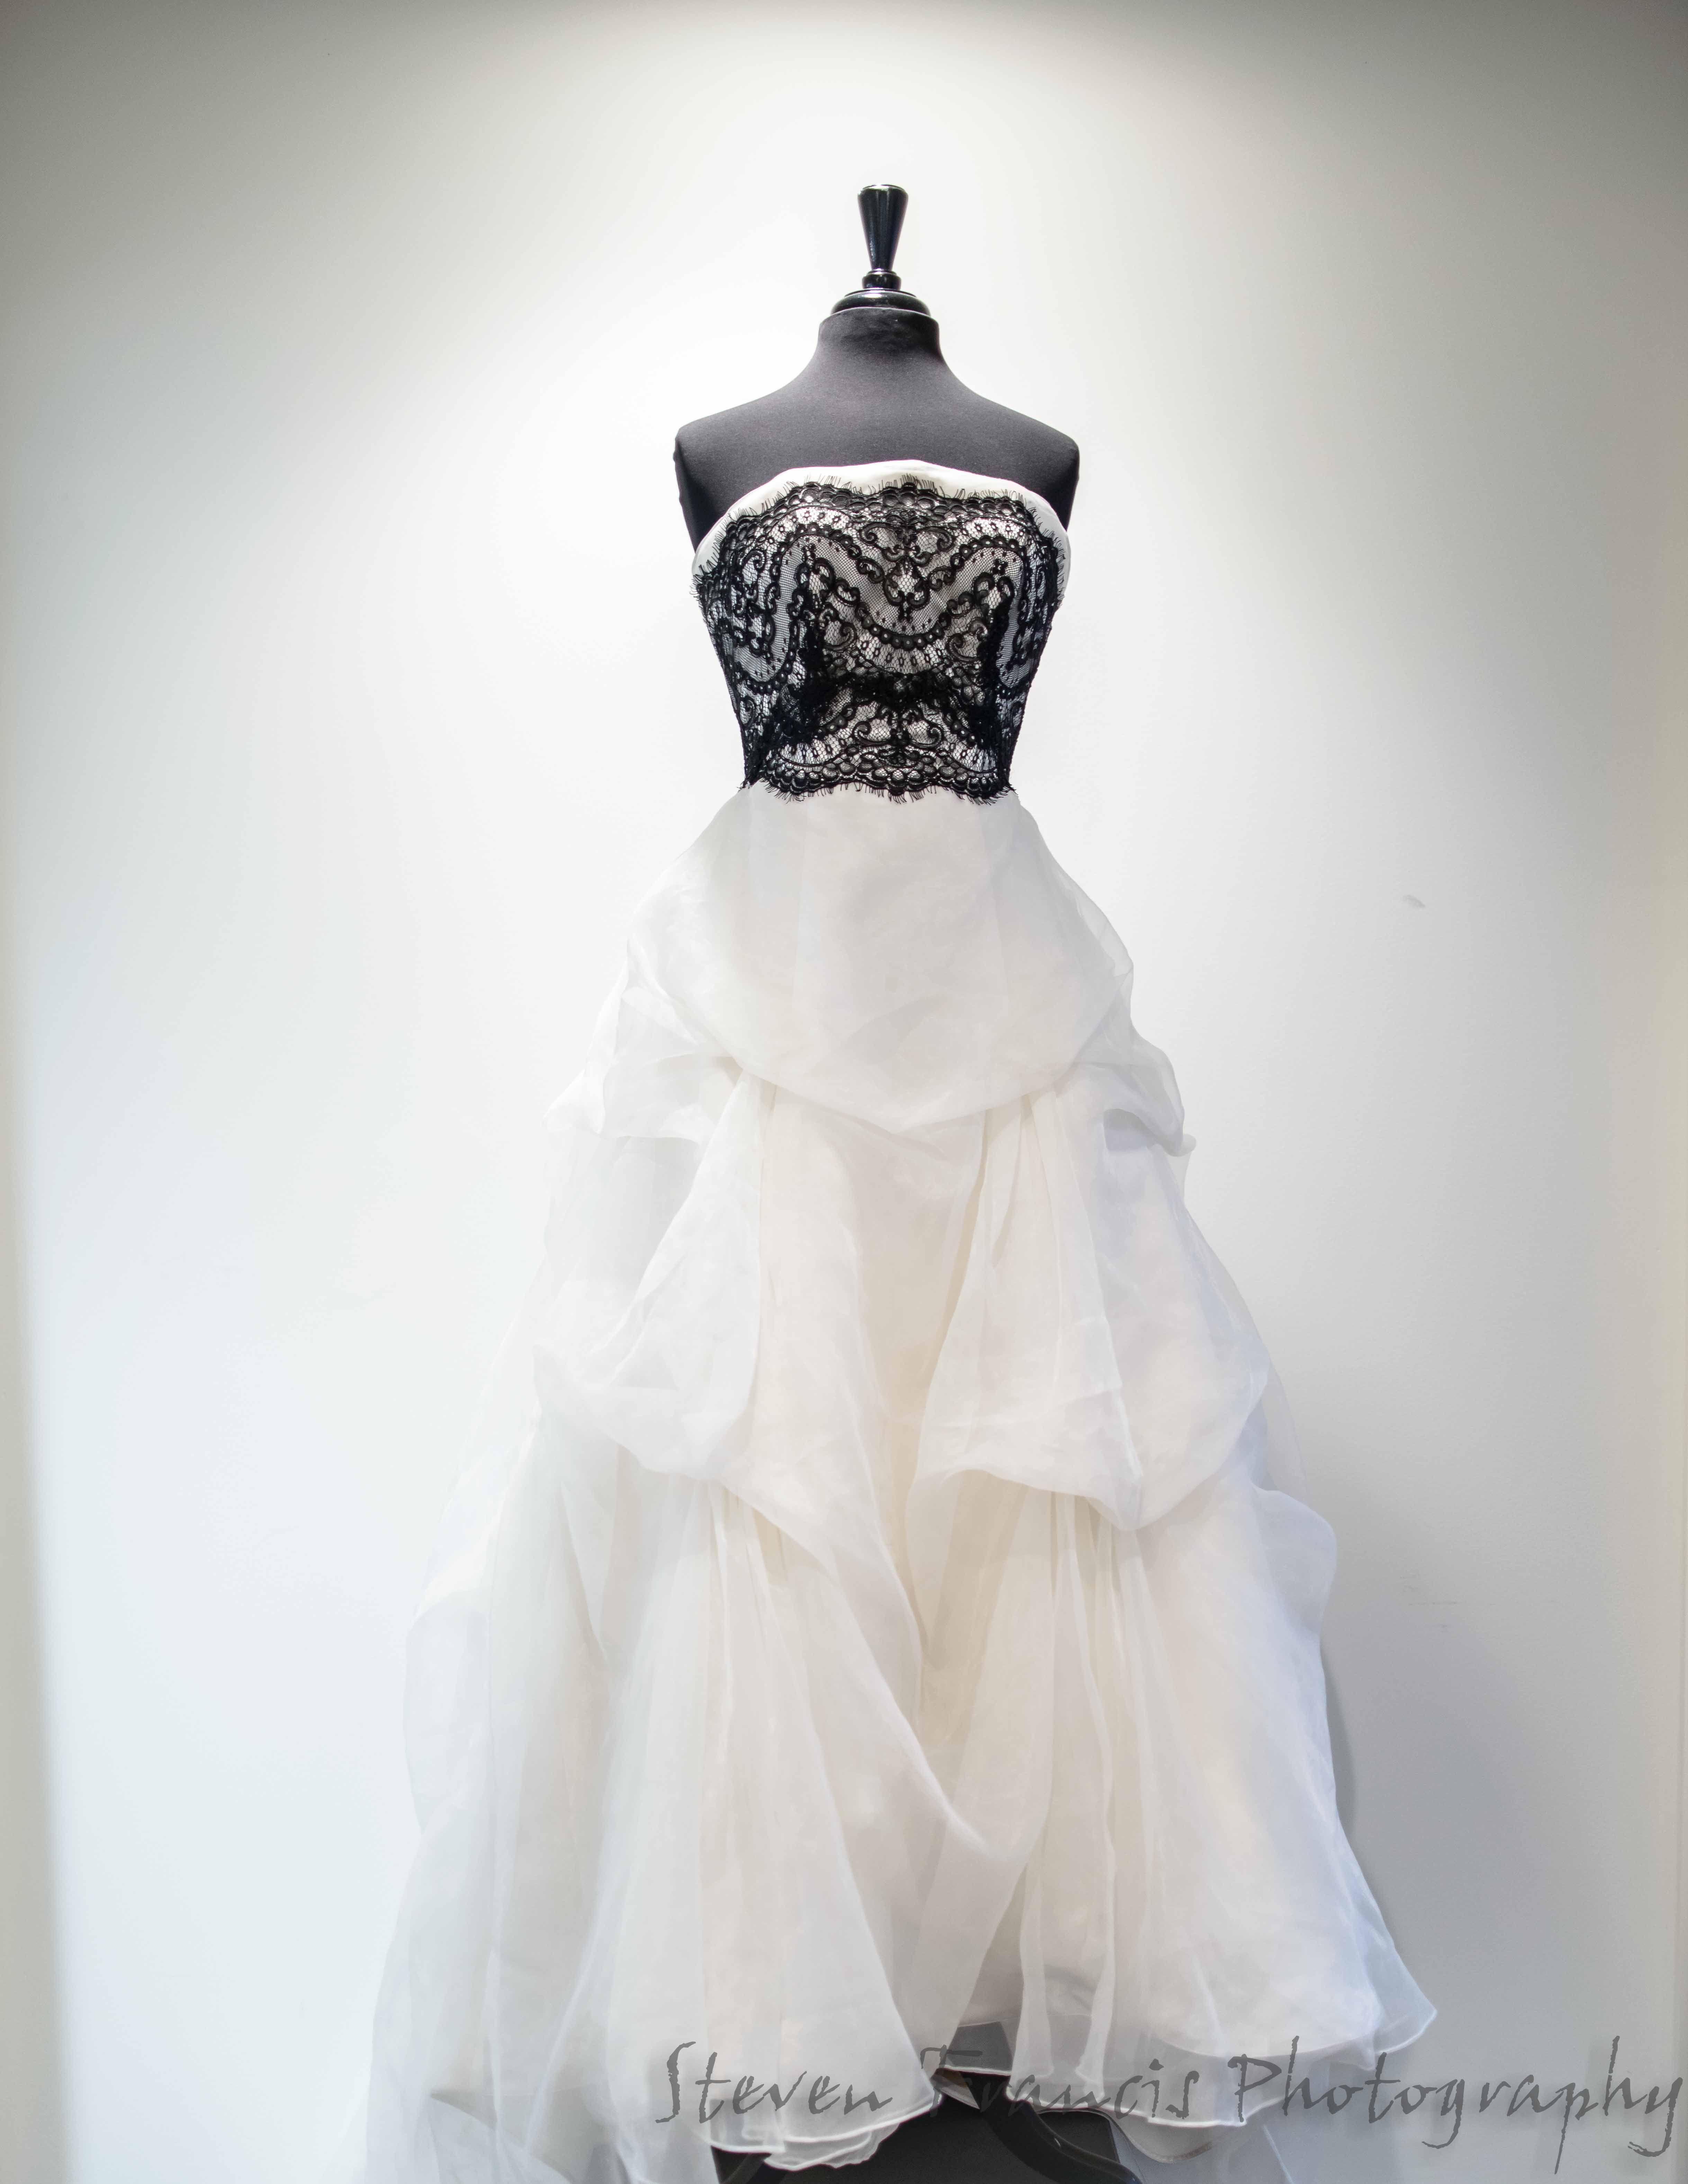 White Starlet Bridal In Harrisburg PA Whitestarletbridal BridalWedding DressesWeddingsAccessories